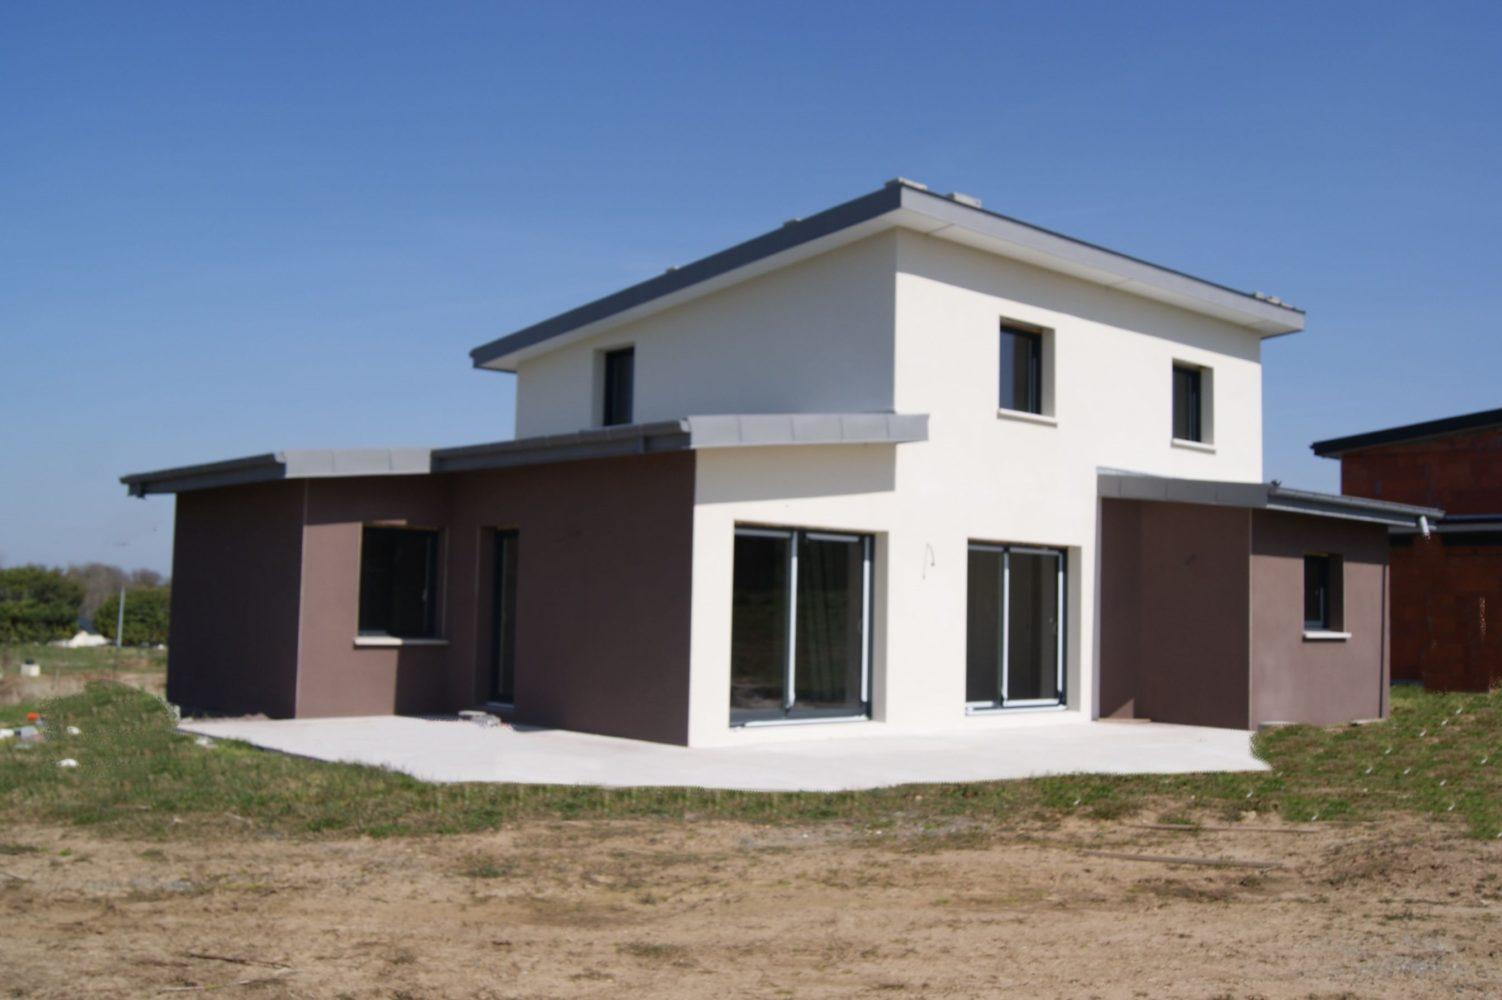 Maison Monopente